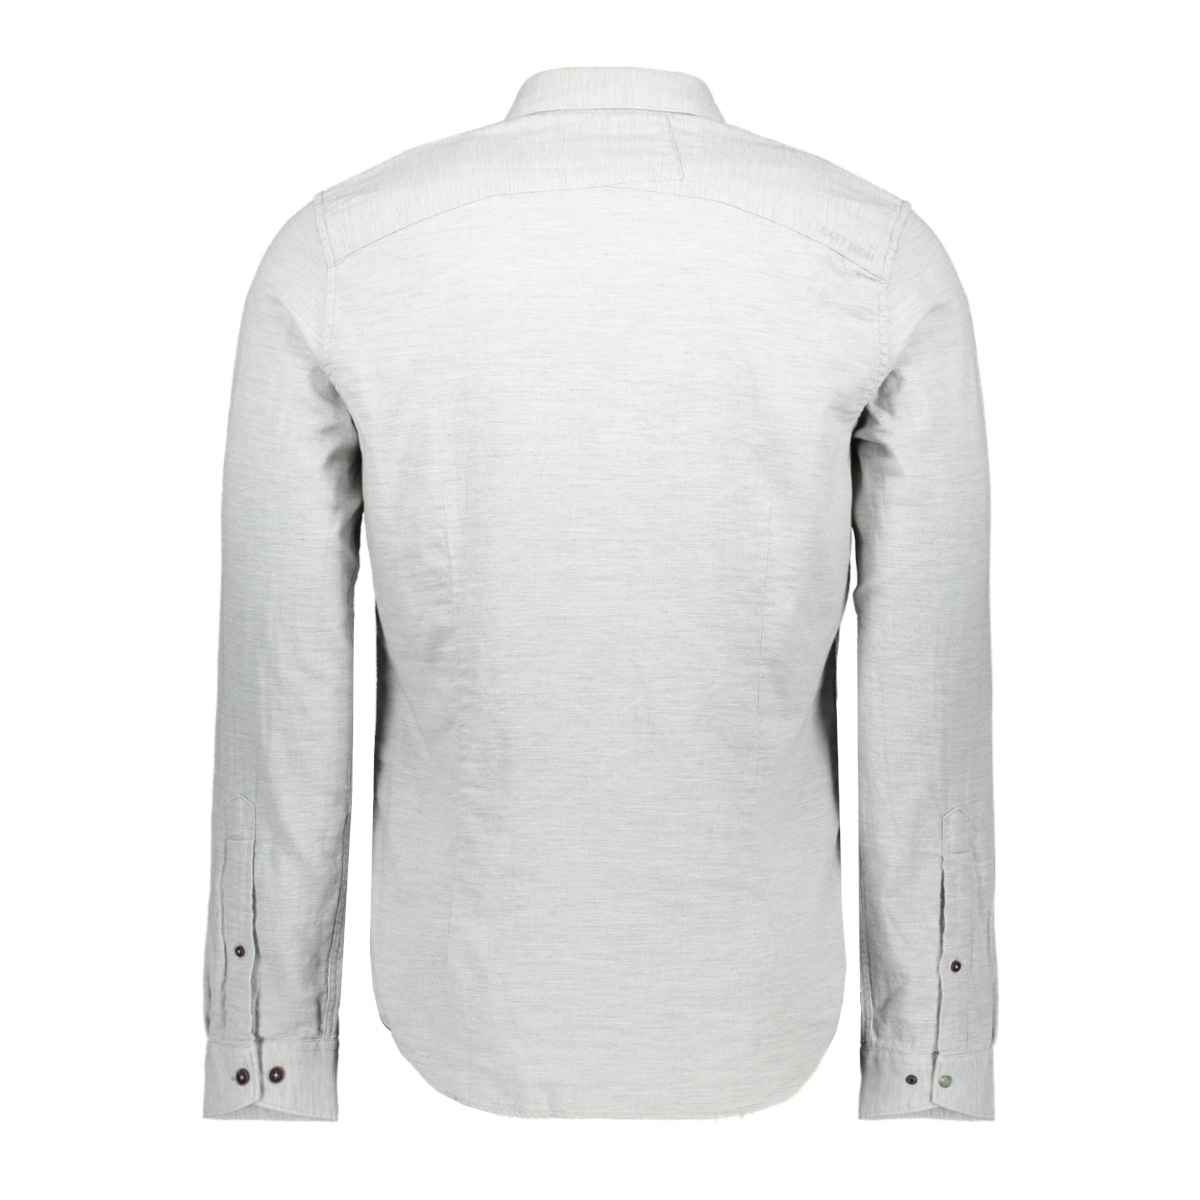 double cloth melange csi201611 cast iron overhemd 910